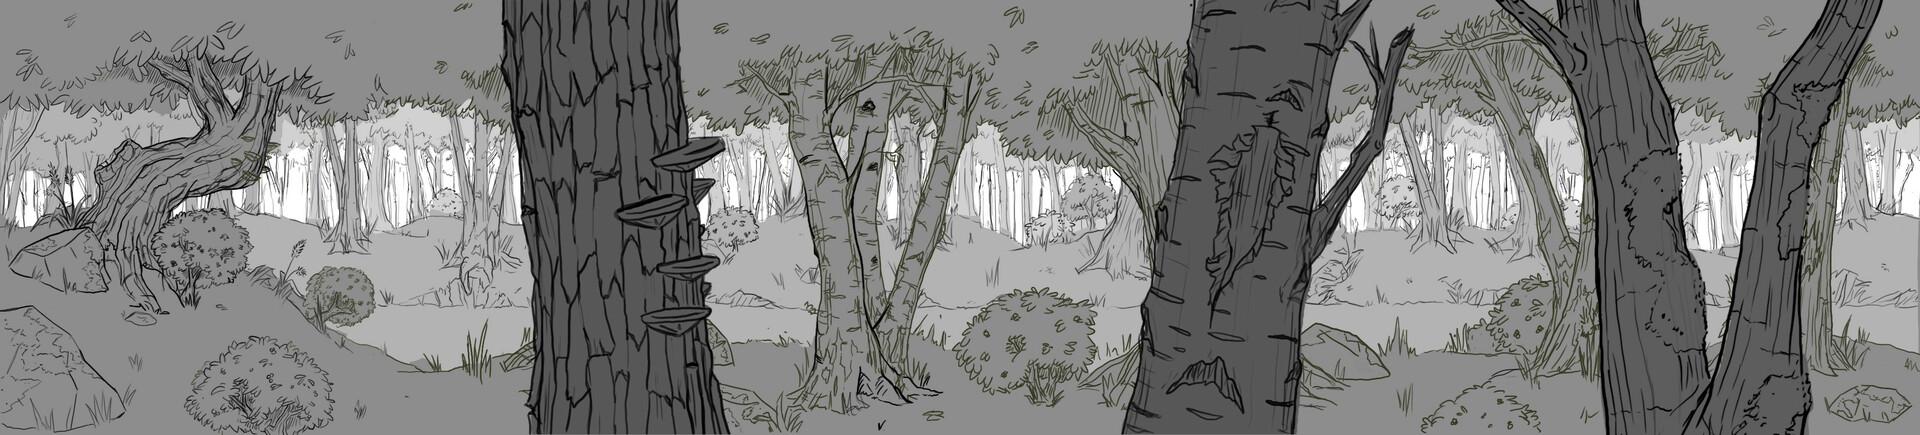 Natalie chenard treepan foreground